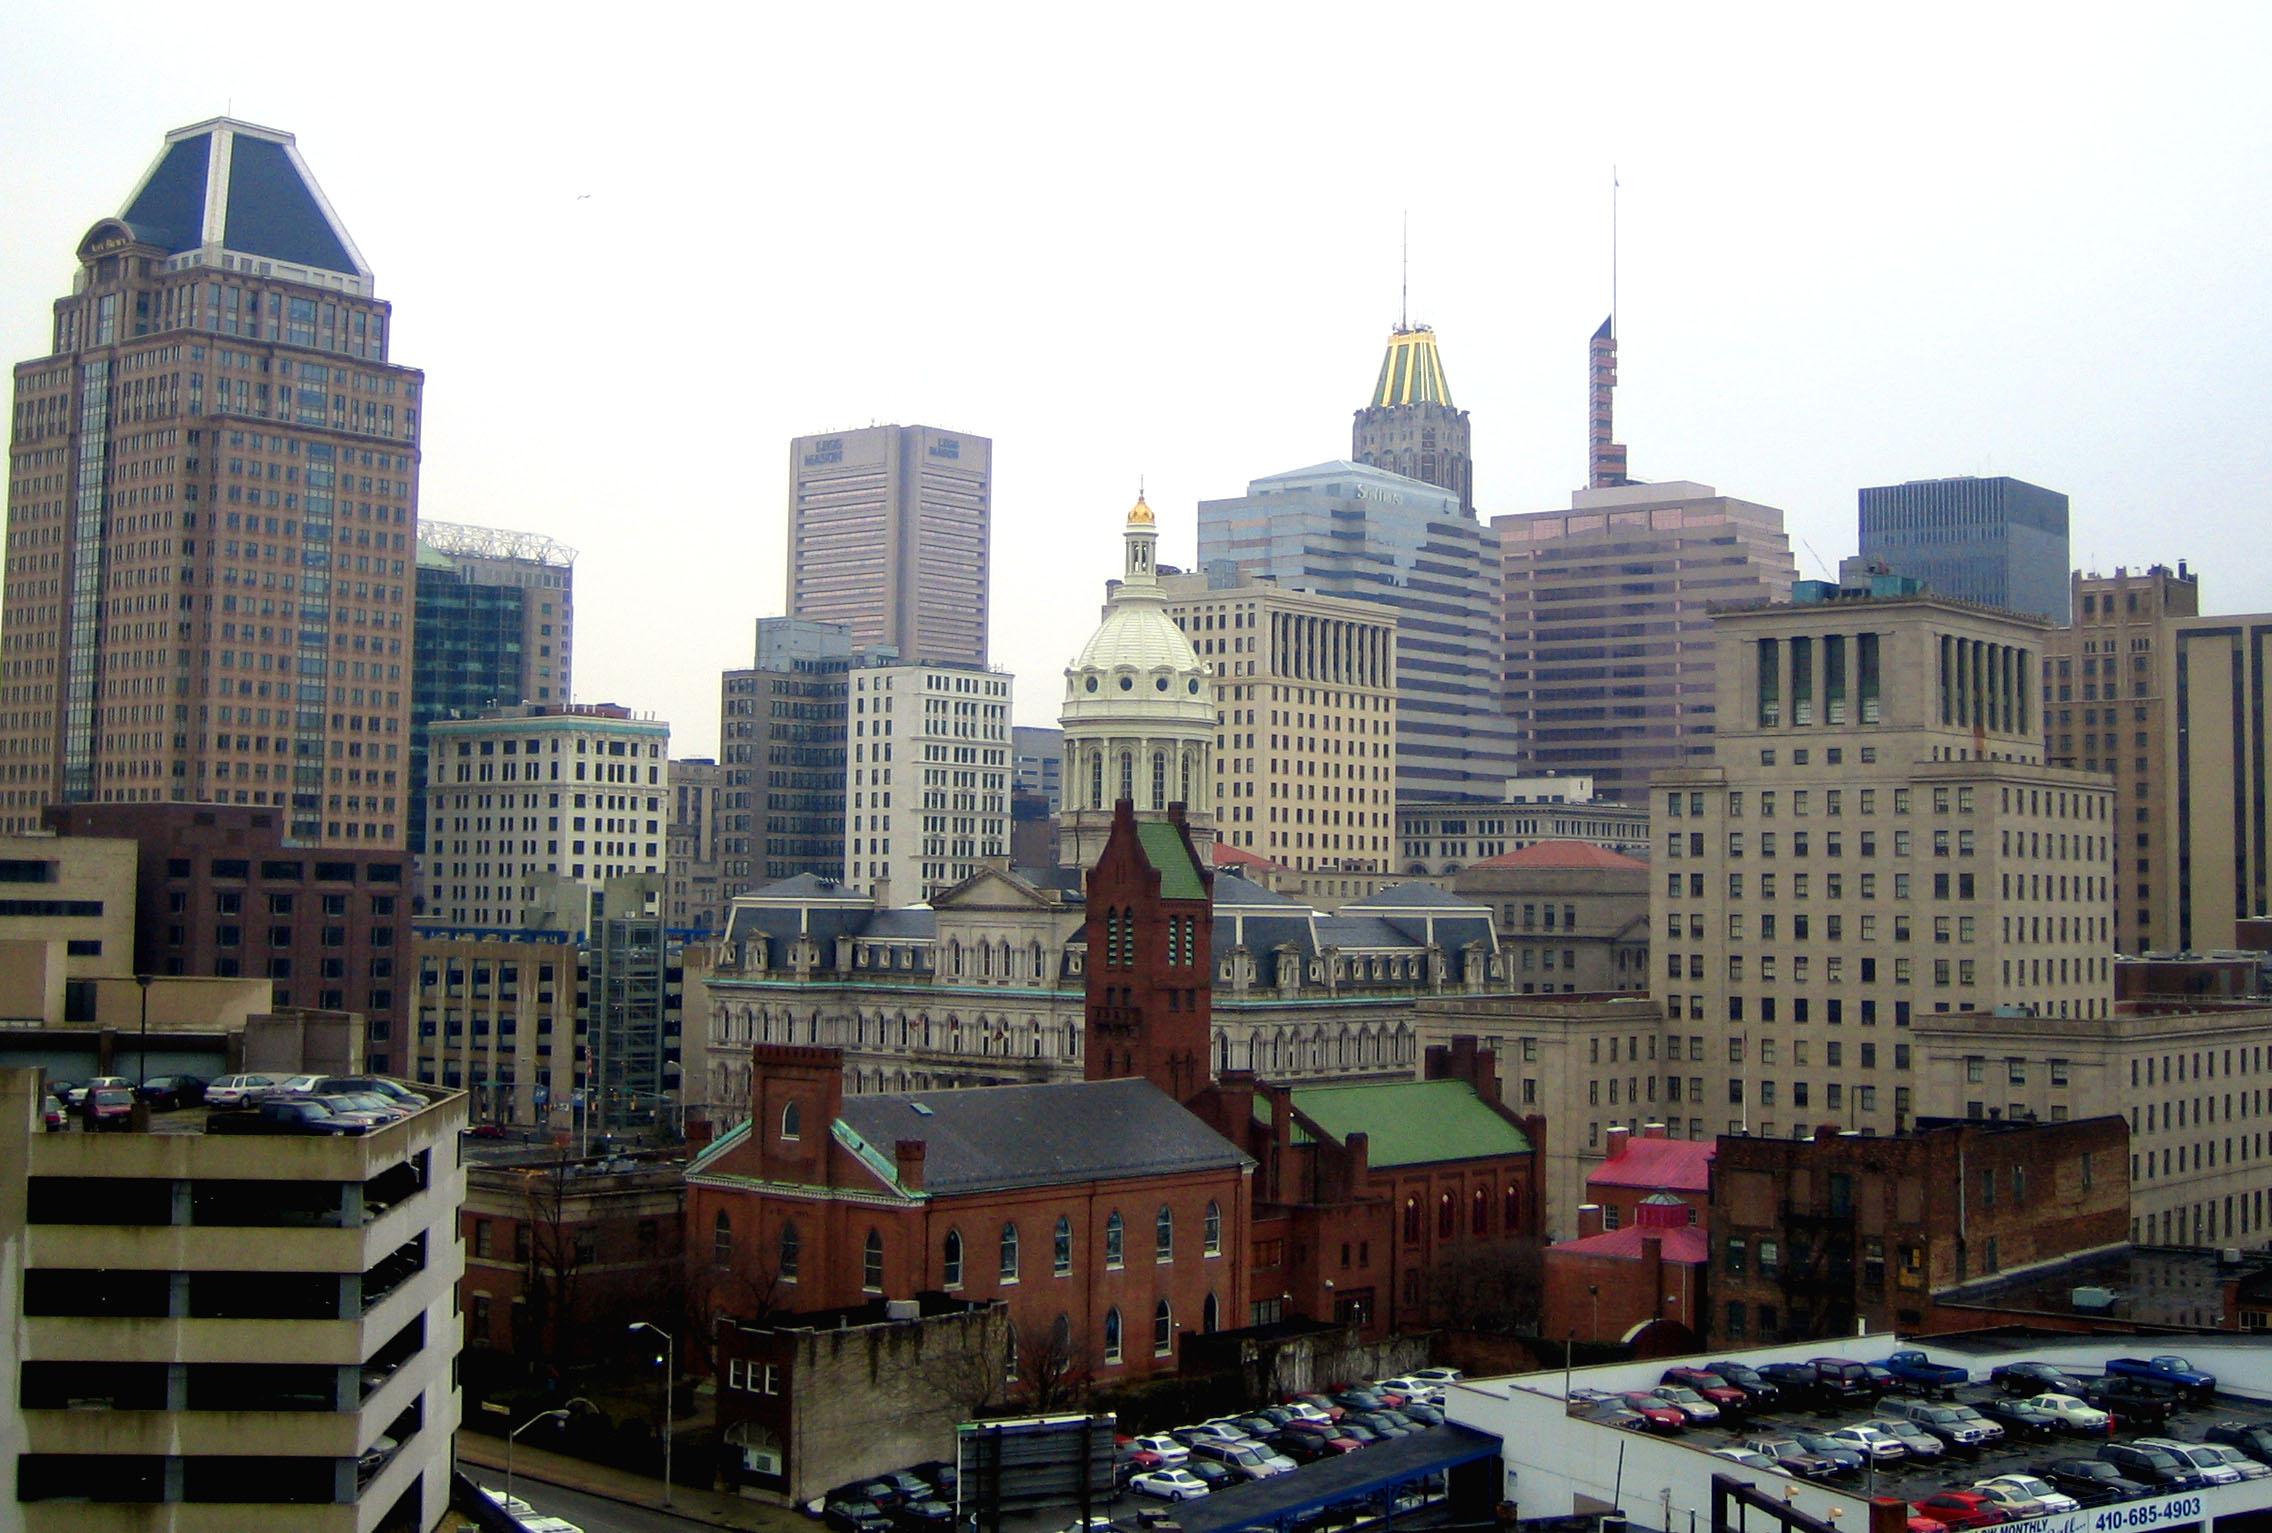 Baltimore İmages | Baltimore City